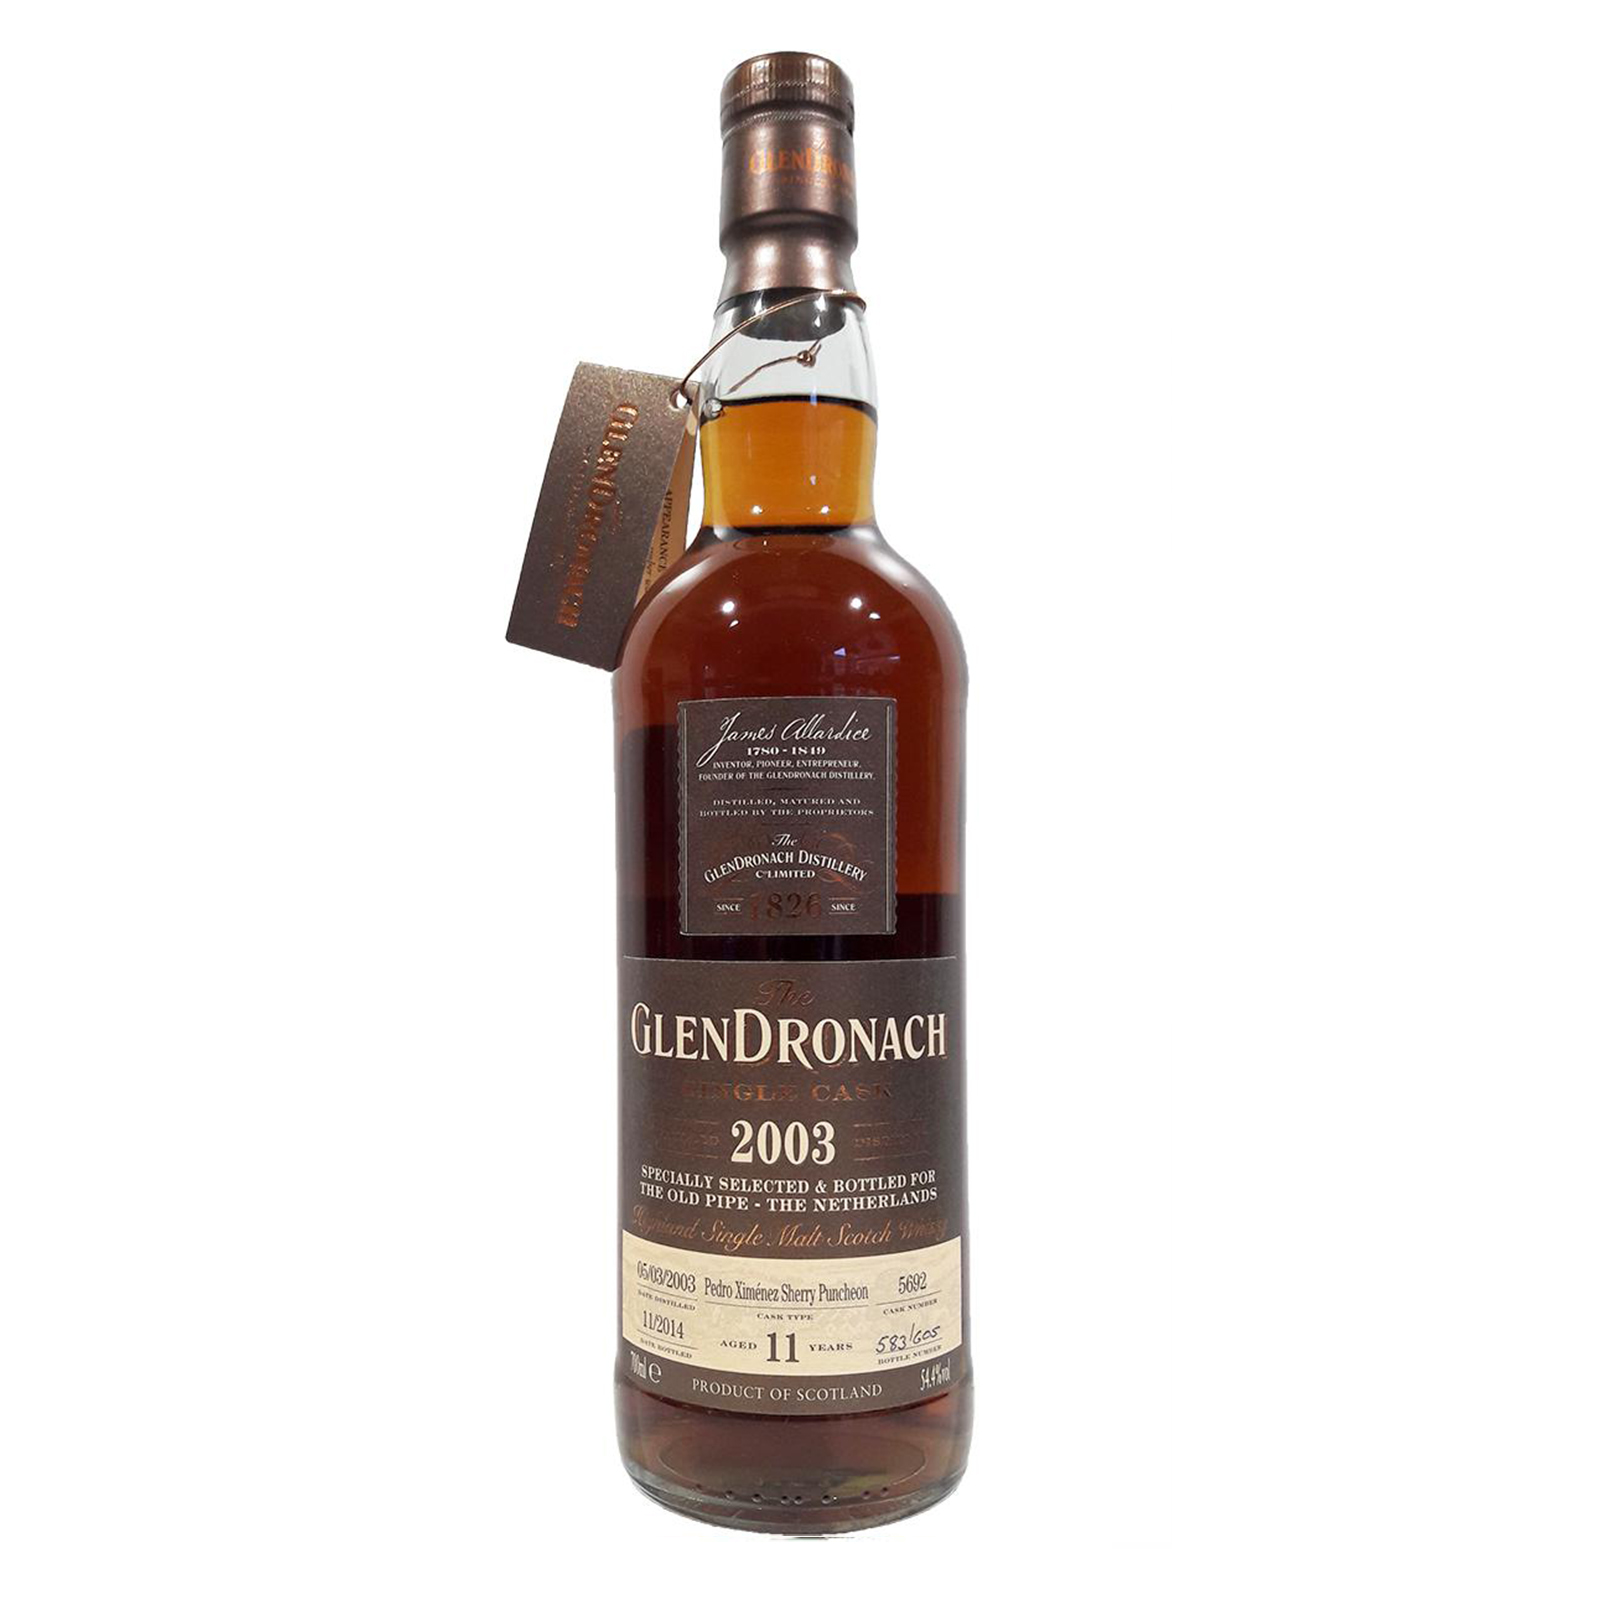 Glendronach 2003 11 years – cask #5692